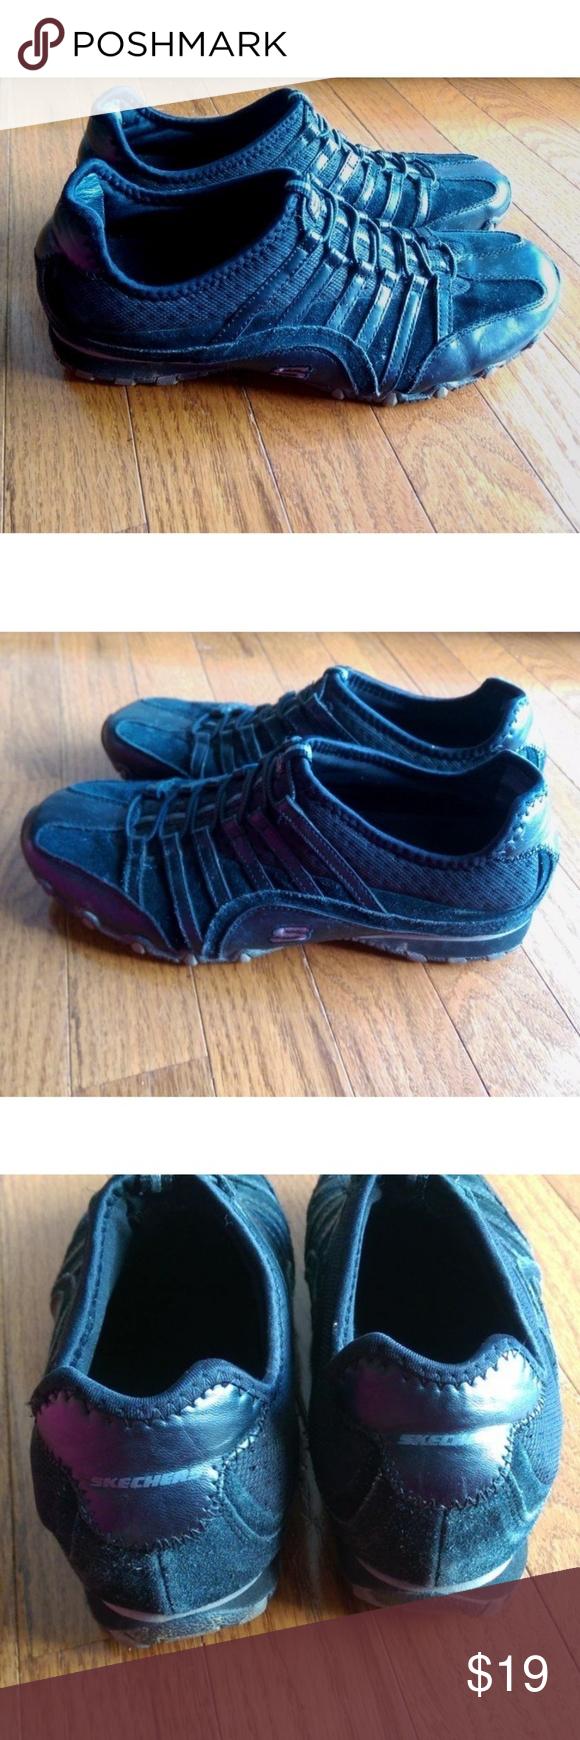 Skechers Pull-on Walking Shoes Black Women's Size 9 - 21439 (Leather Upper)